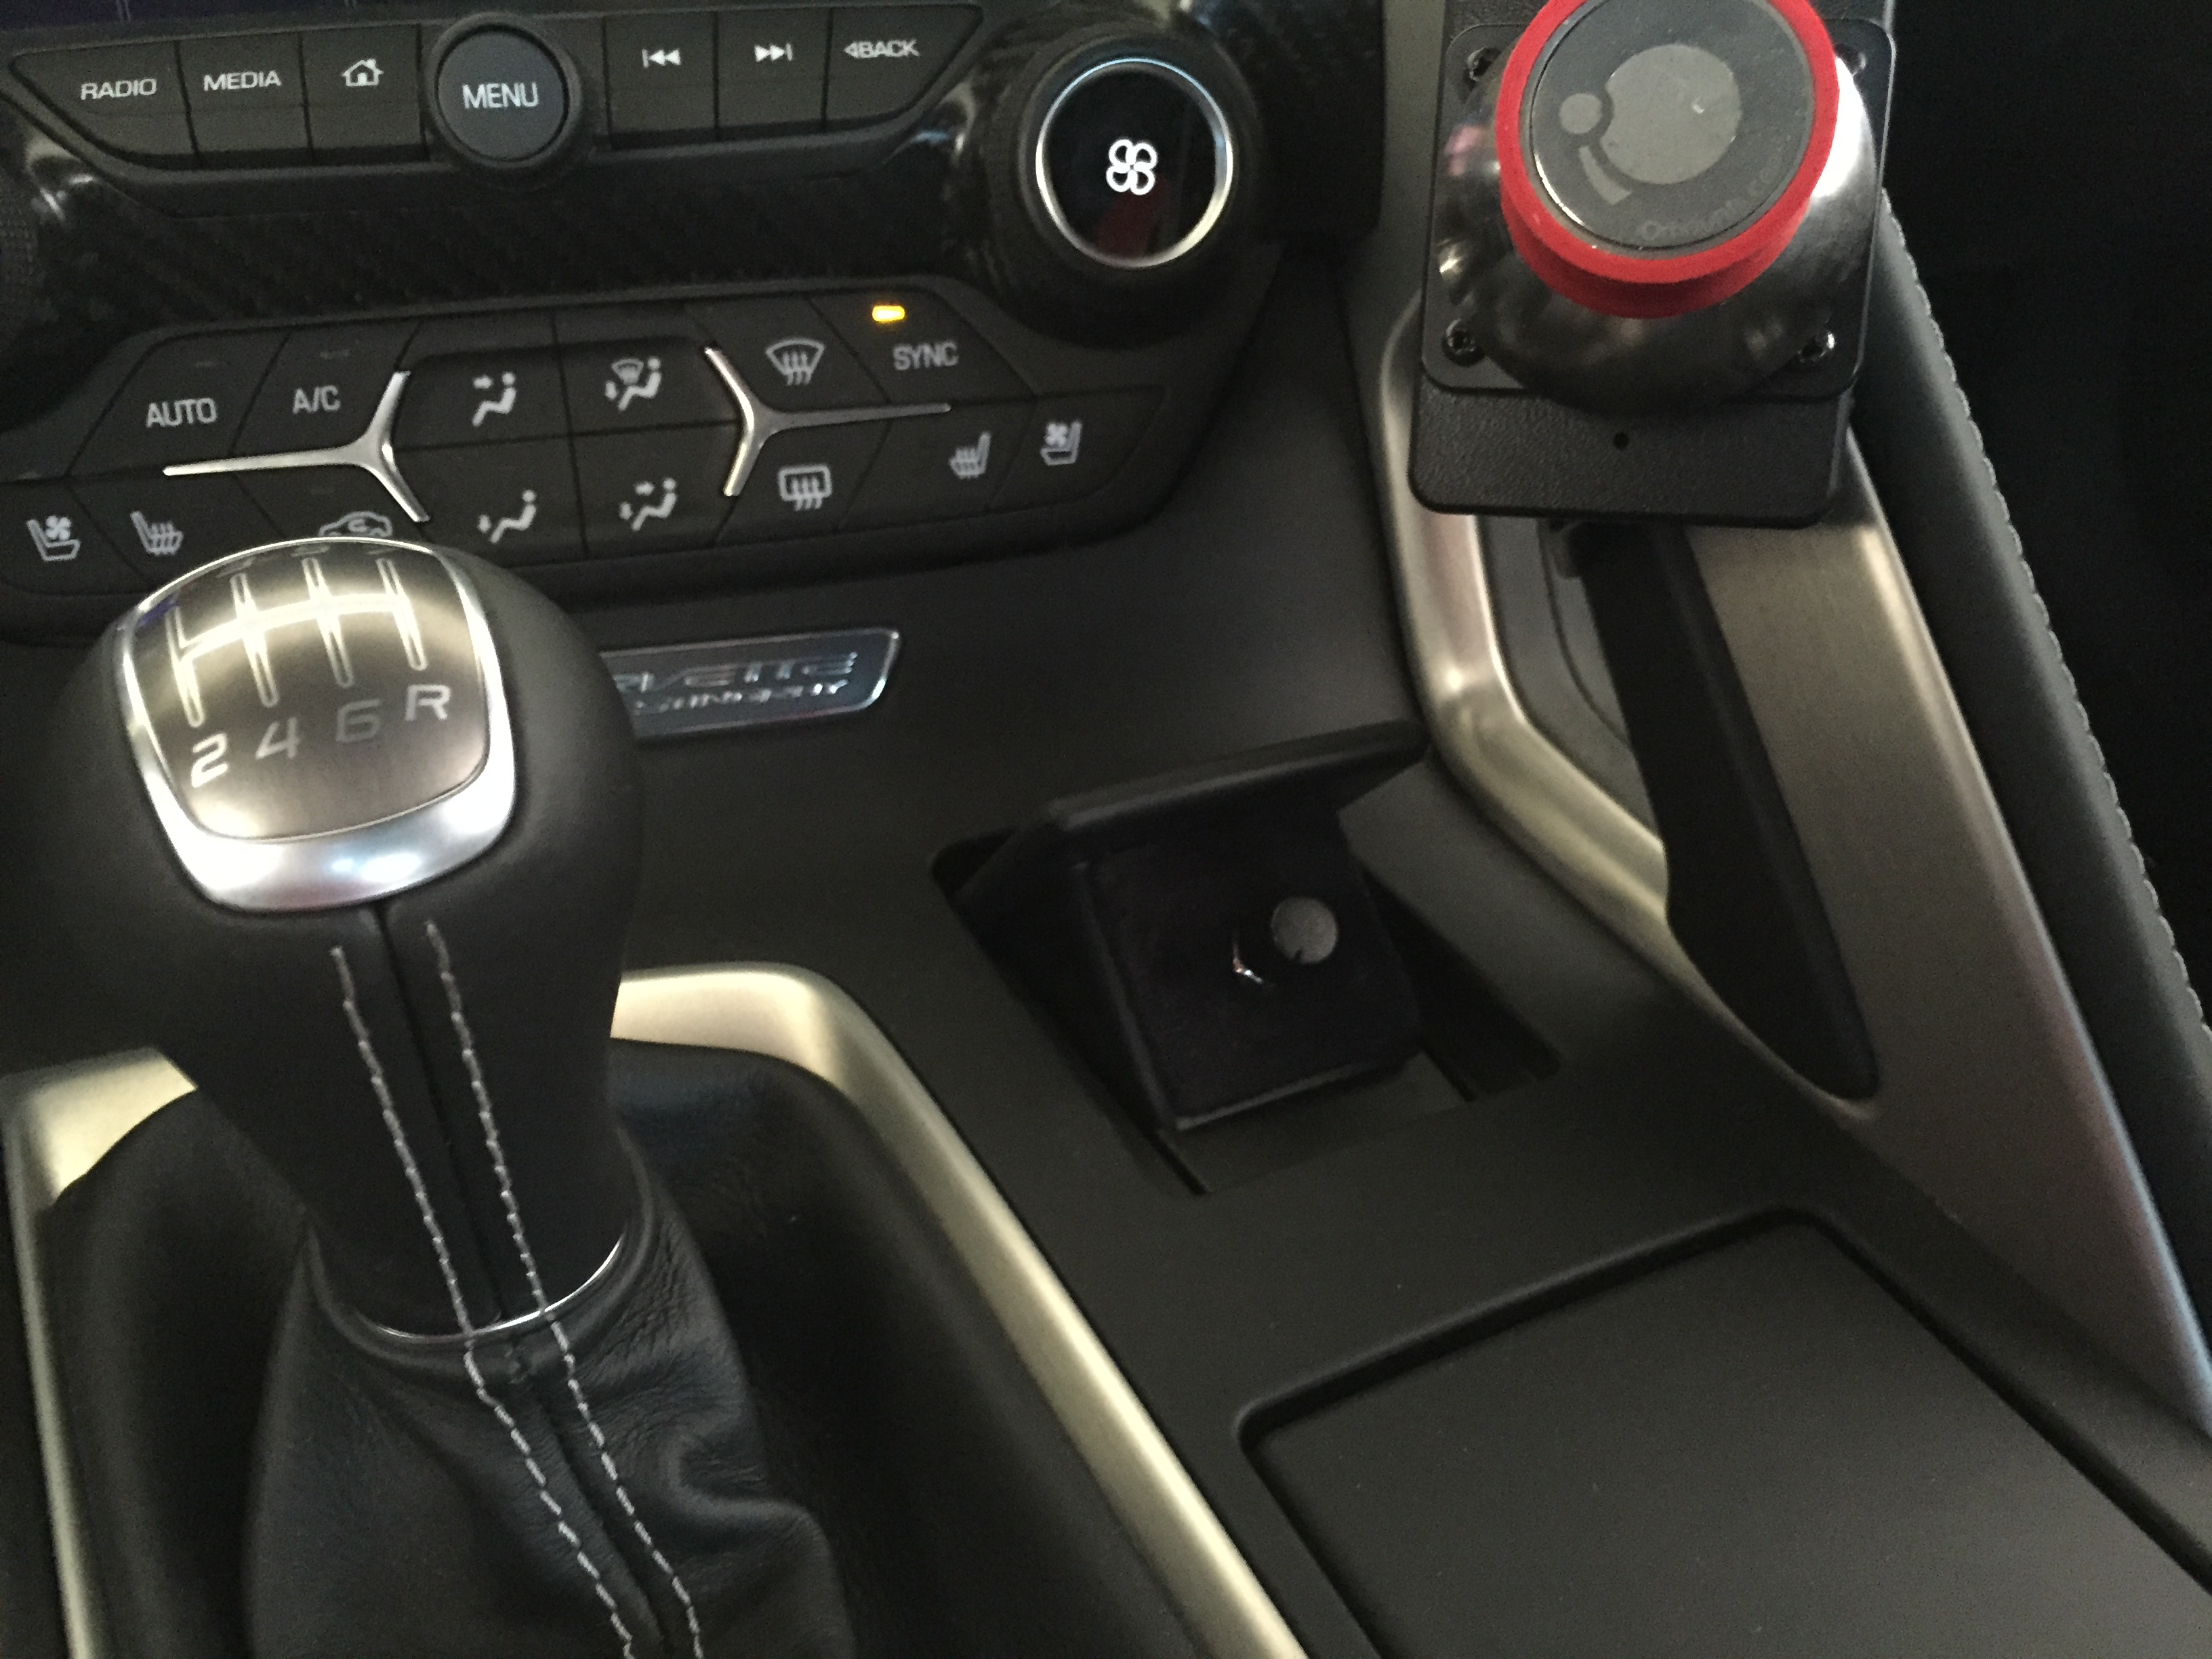 Subwoofer Install. Name Img0630 Views 3415 Size 125. Corvette. C7 Corvette Bose Wiring Diagram At Scoala.co